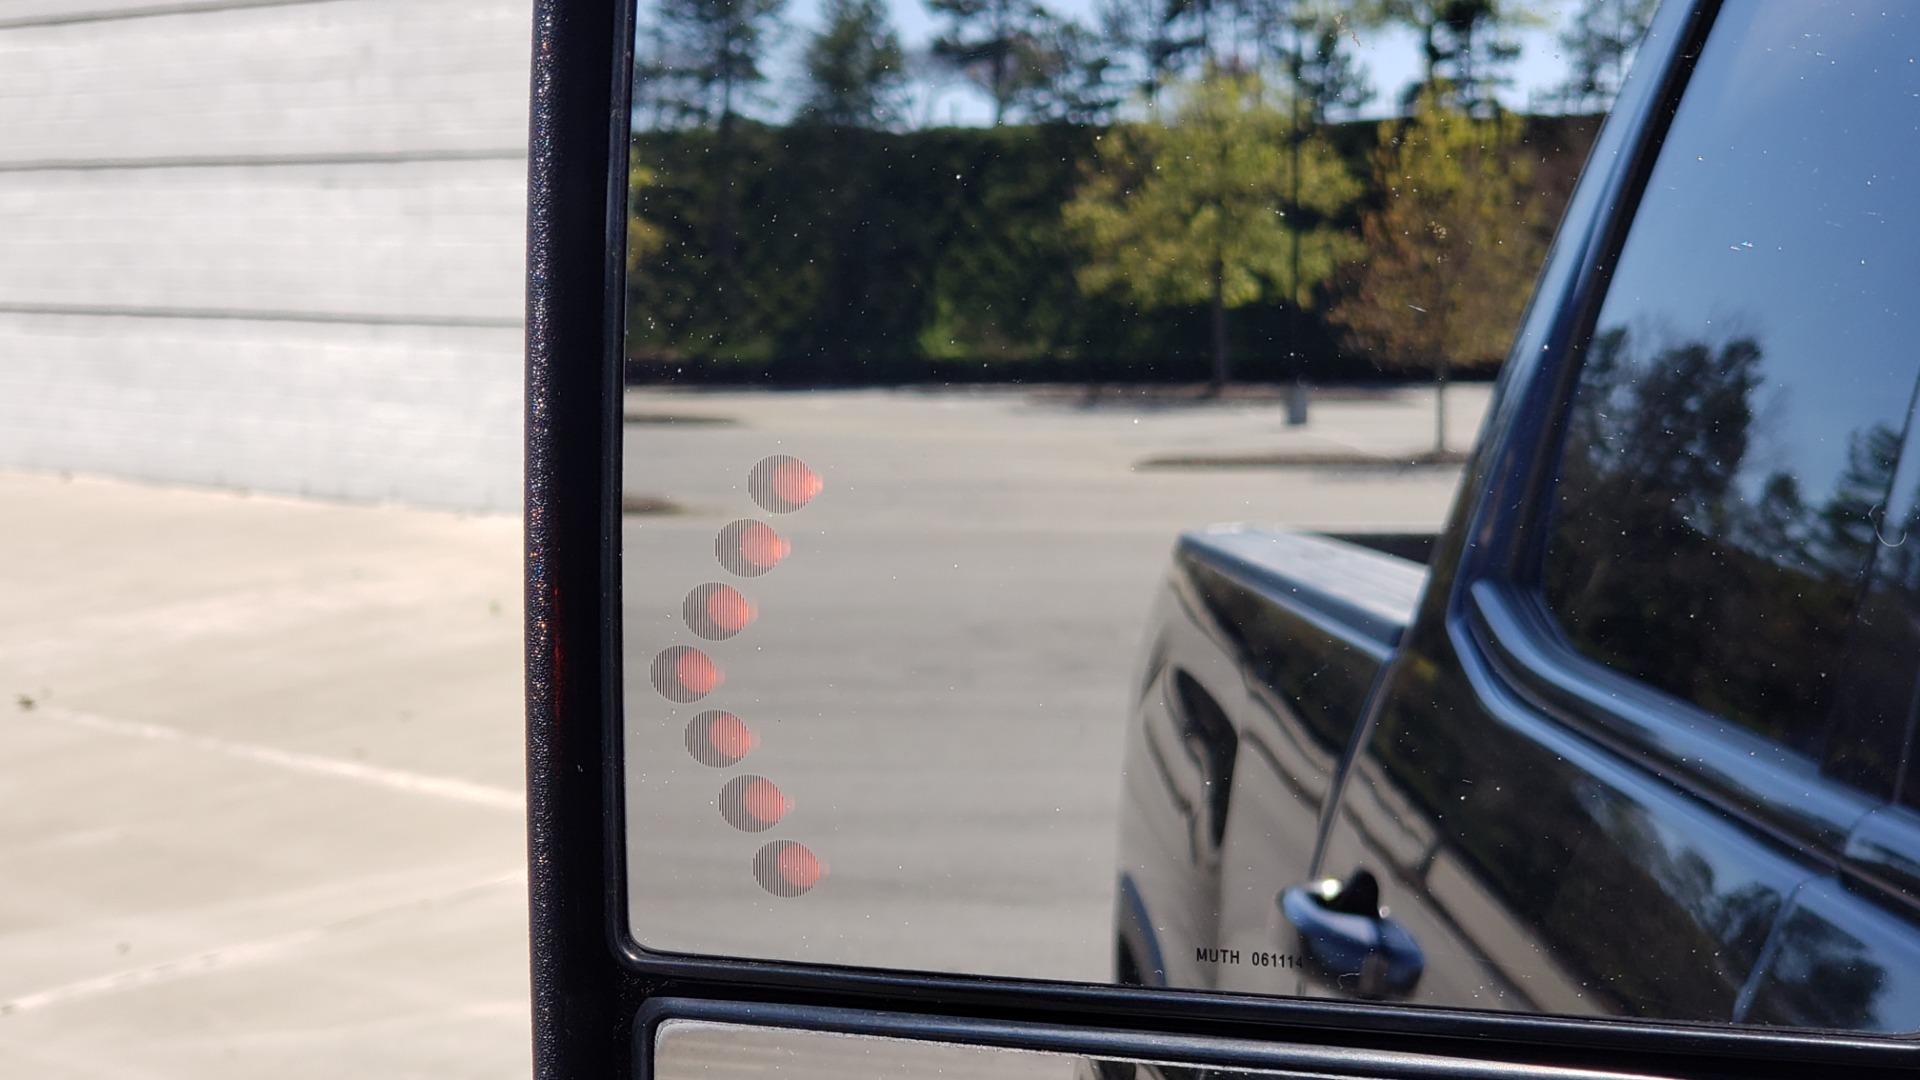 Used 2015 GMC SIERRA 2500HD DENALI 4WD CREWCAB / 6.6L DURAMAX / 6-SPD AUTO / NAV / BOSE for sale $50,995 at Formula Imports in Charlotte NC 28227 28